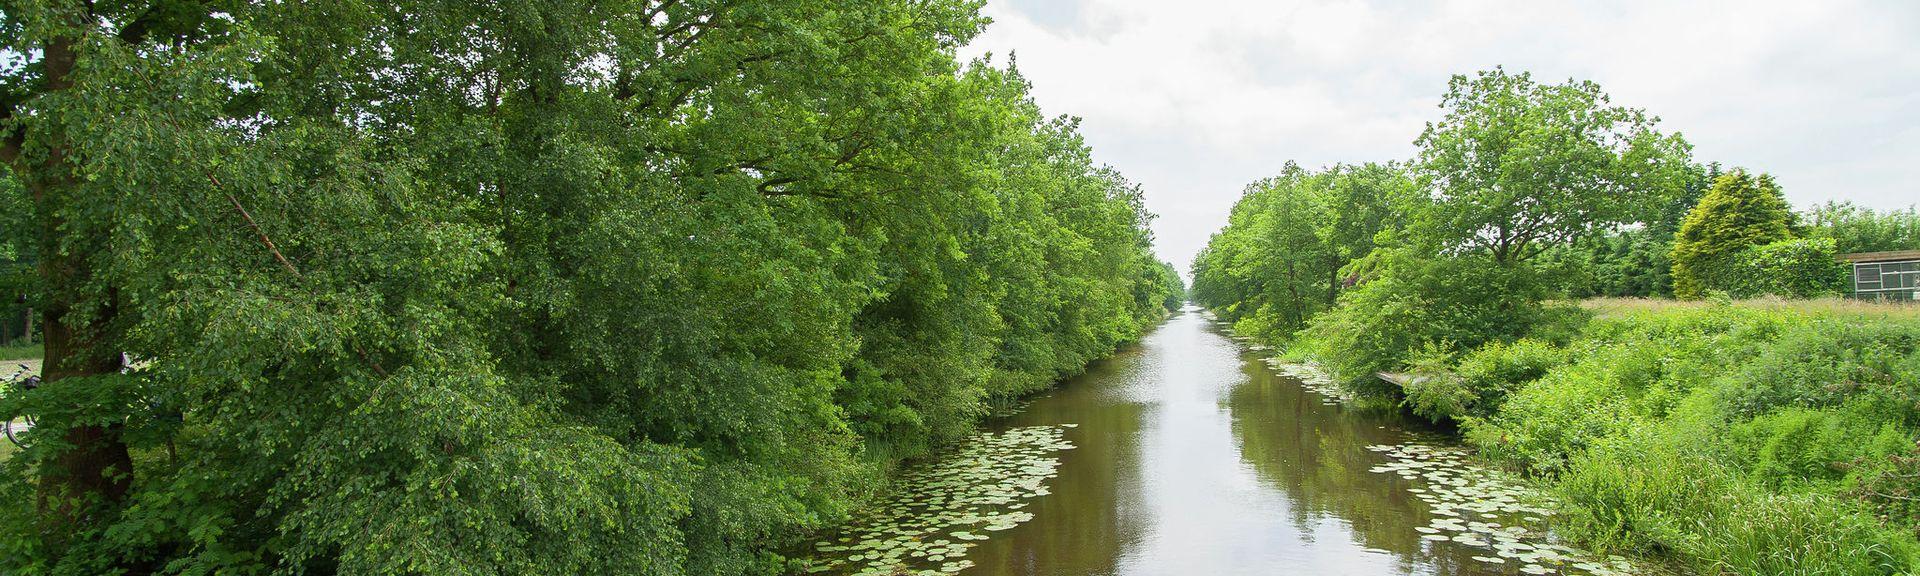 Dalen, Drente, Holanda